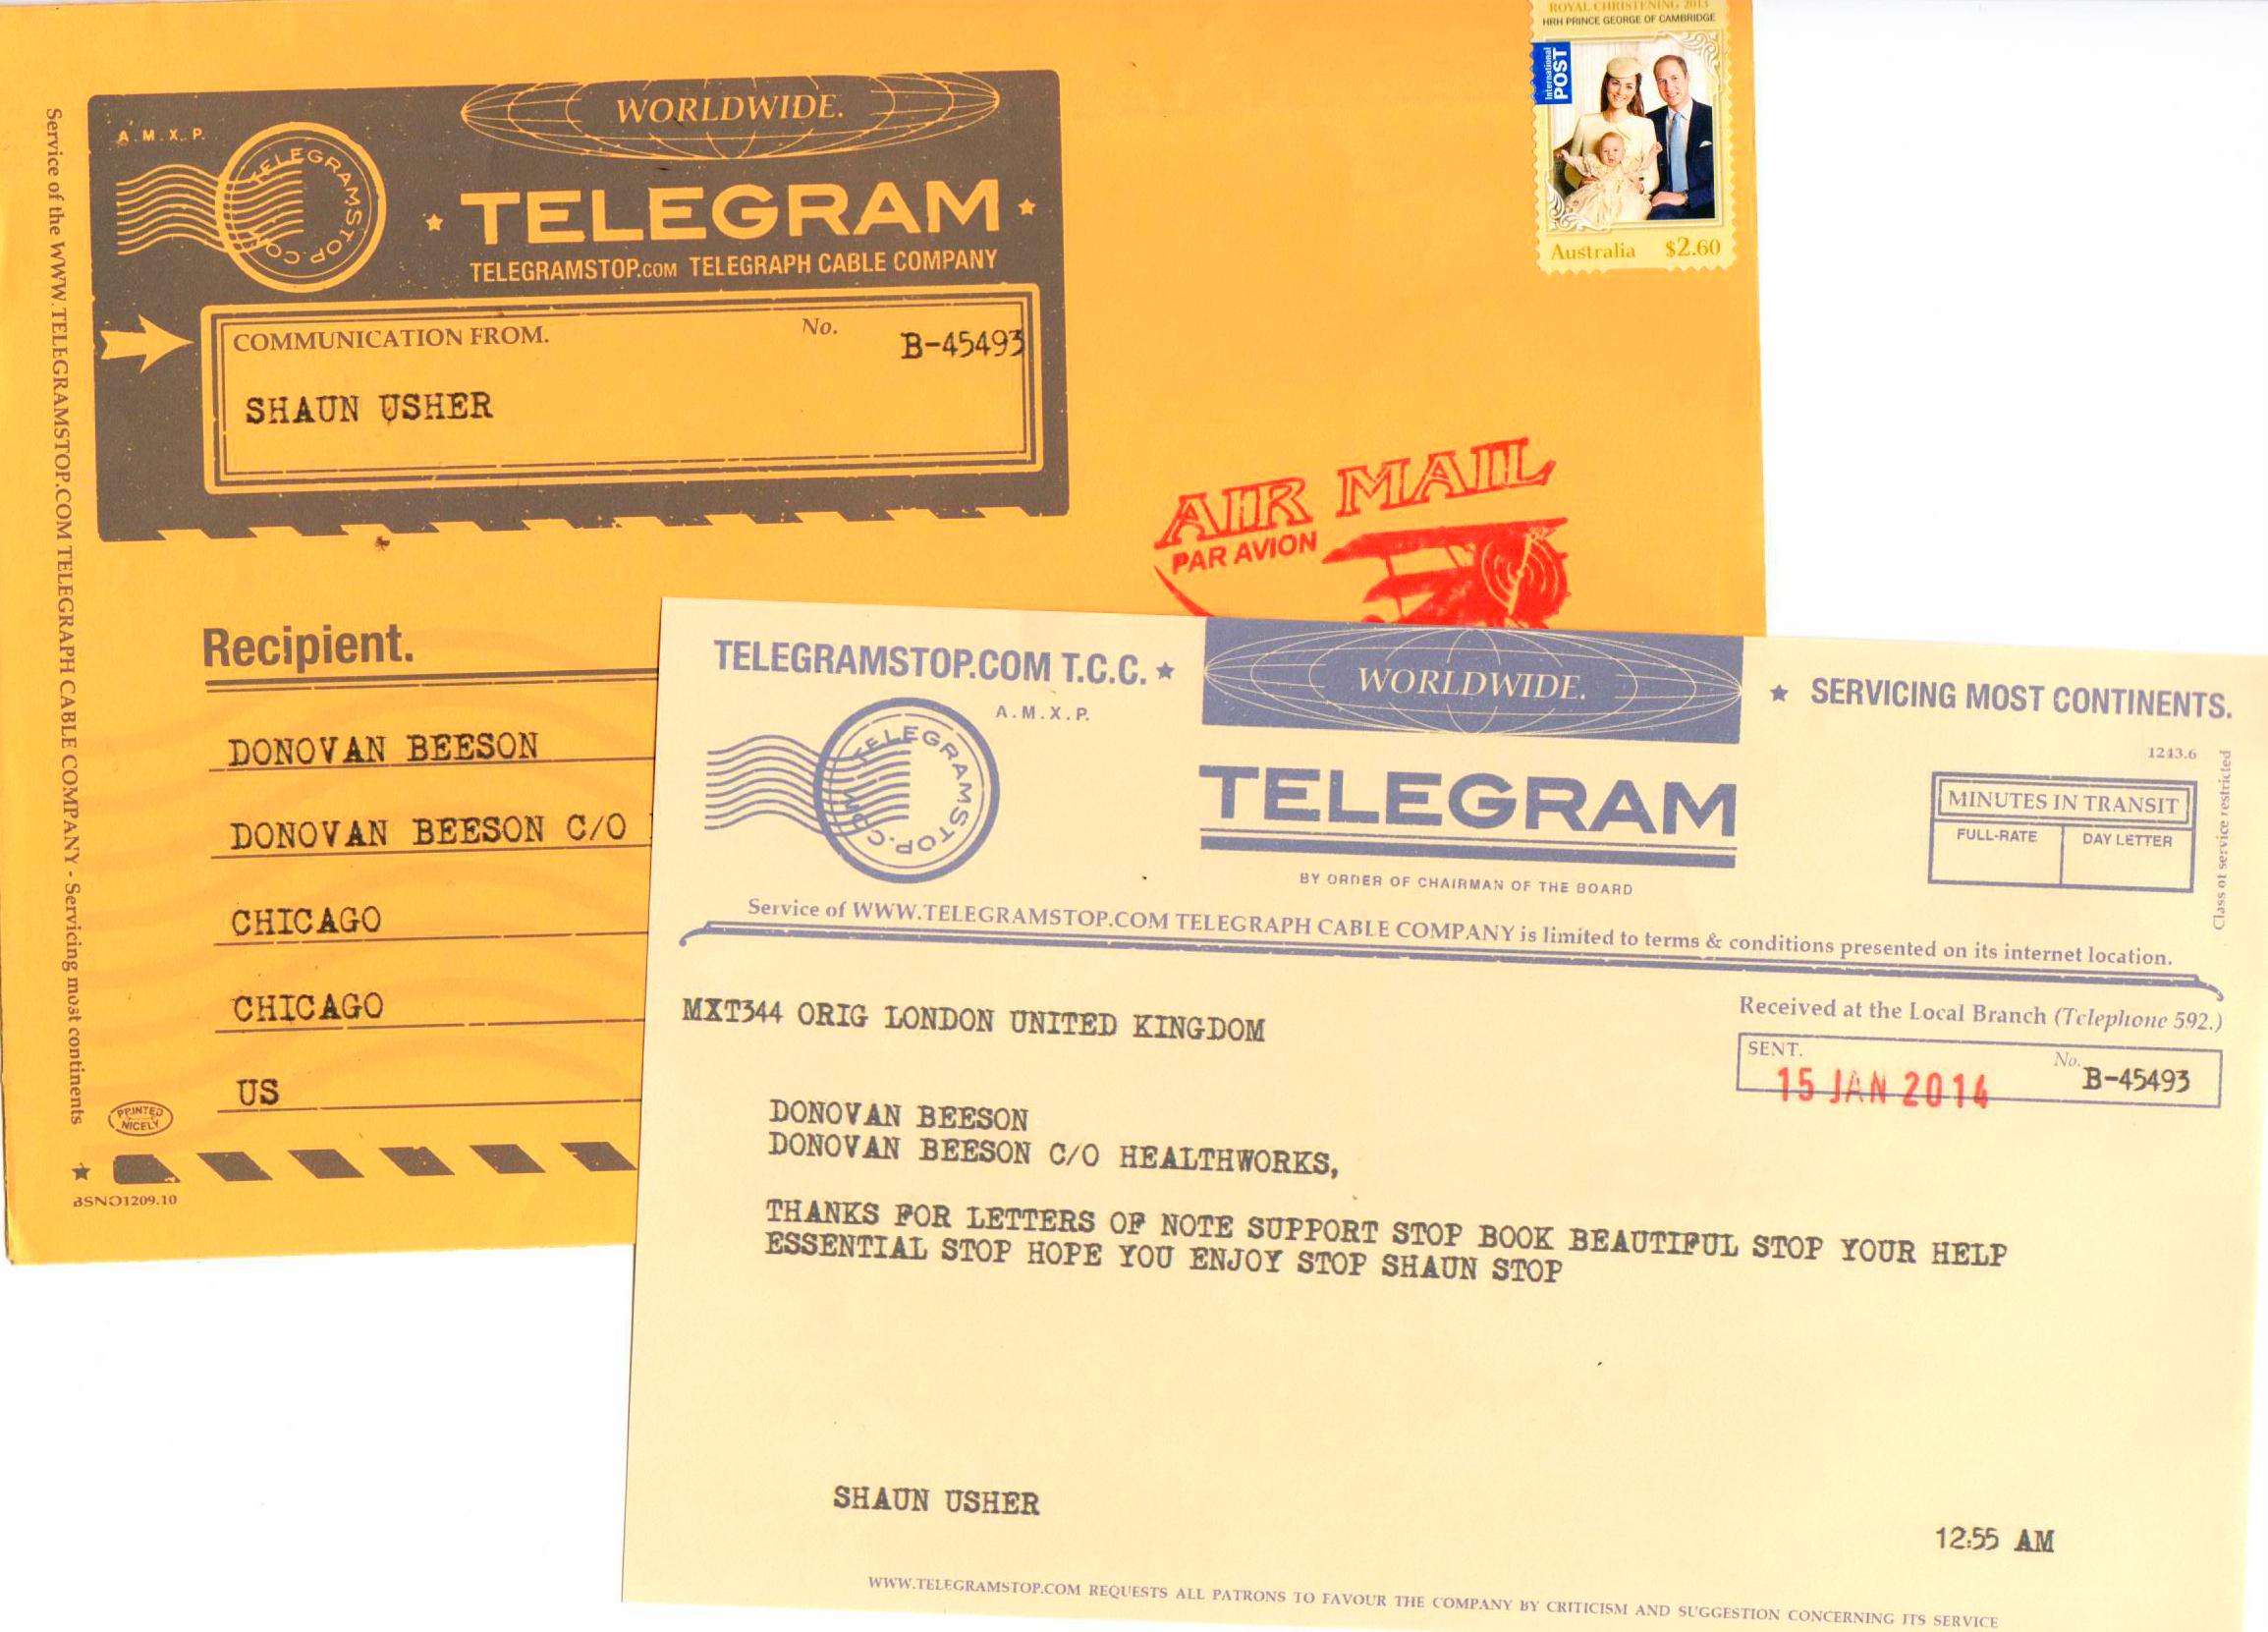 Letter writers alliance send a telegram sort of telegram from au spiritdancerdesigns Choice Image